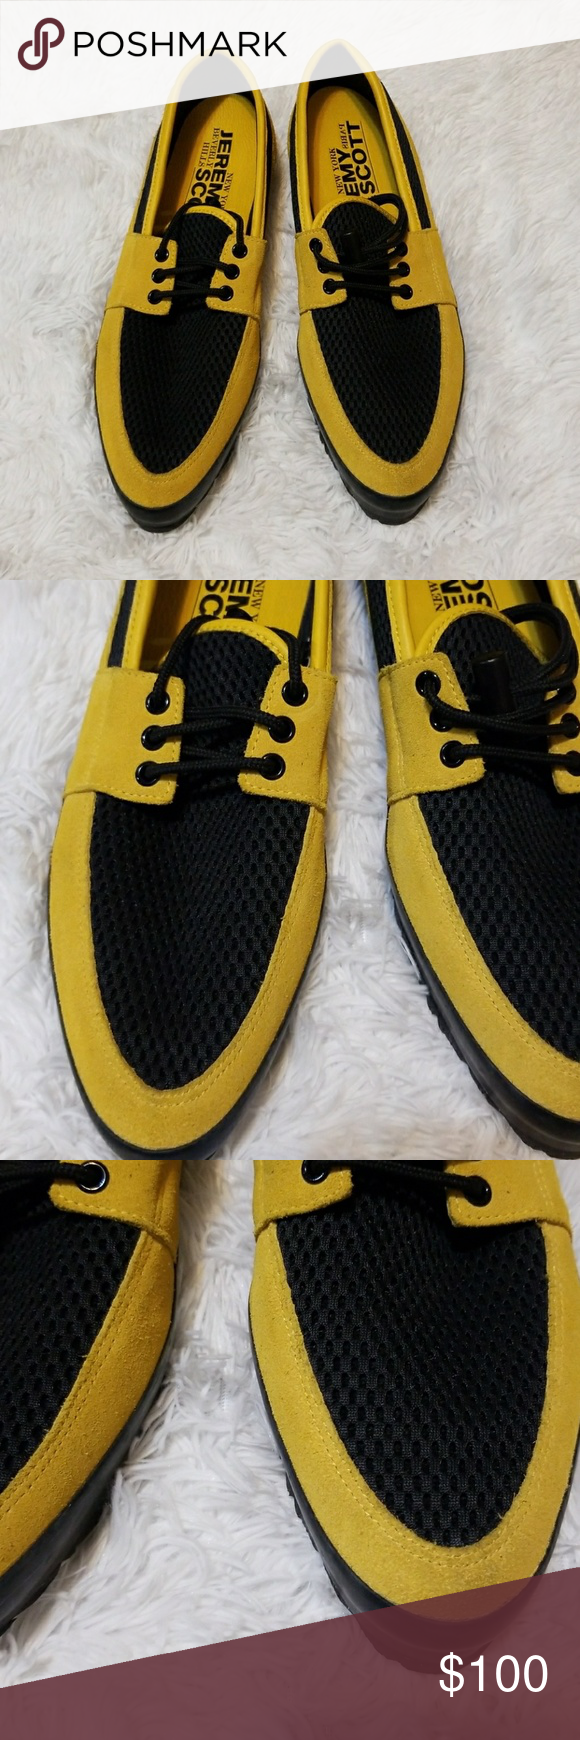 Jeremy scott adidas mocassino scarpe creeper stile, jeremy scott